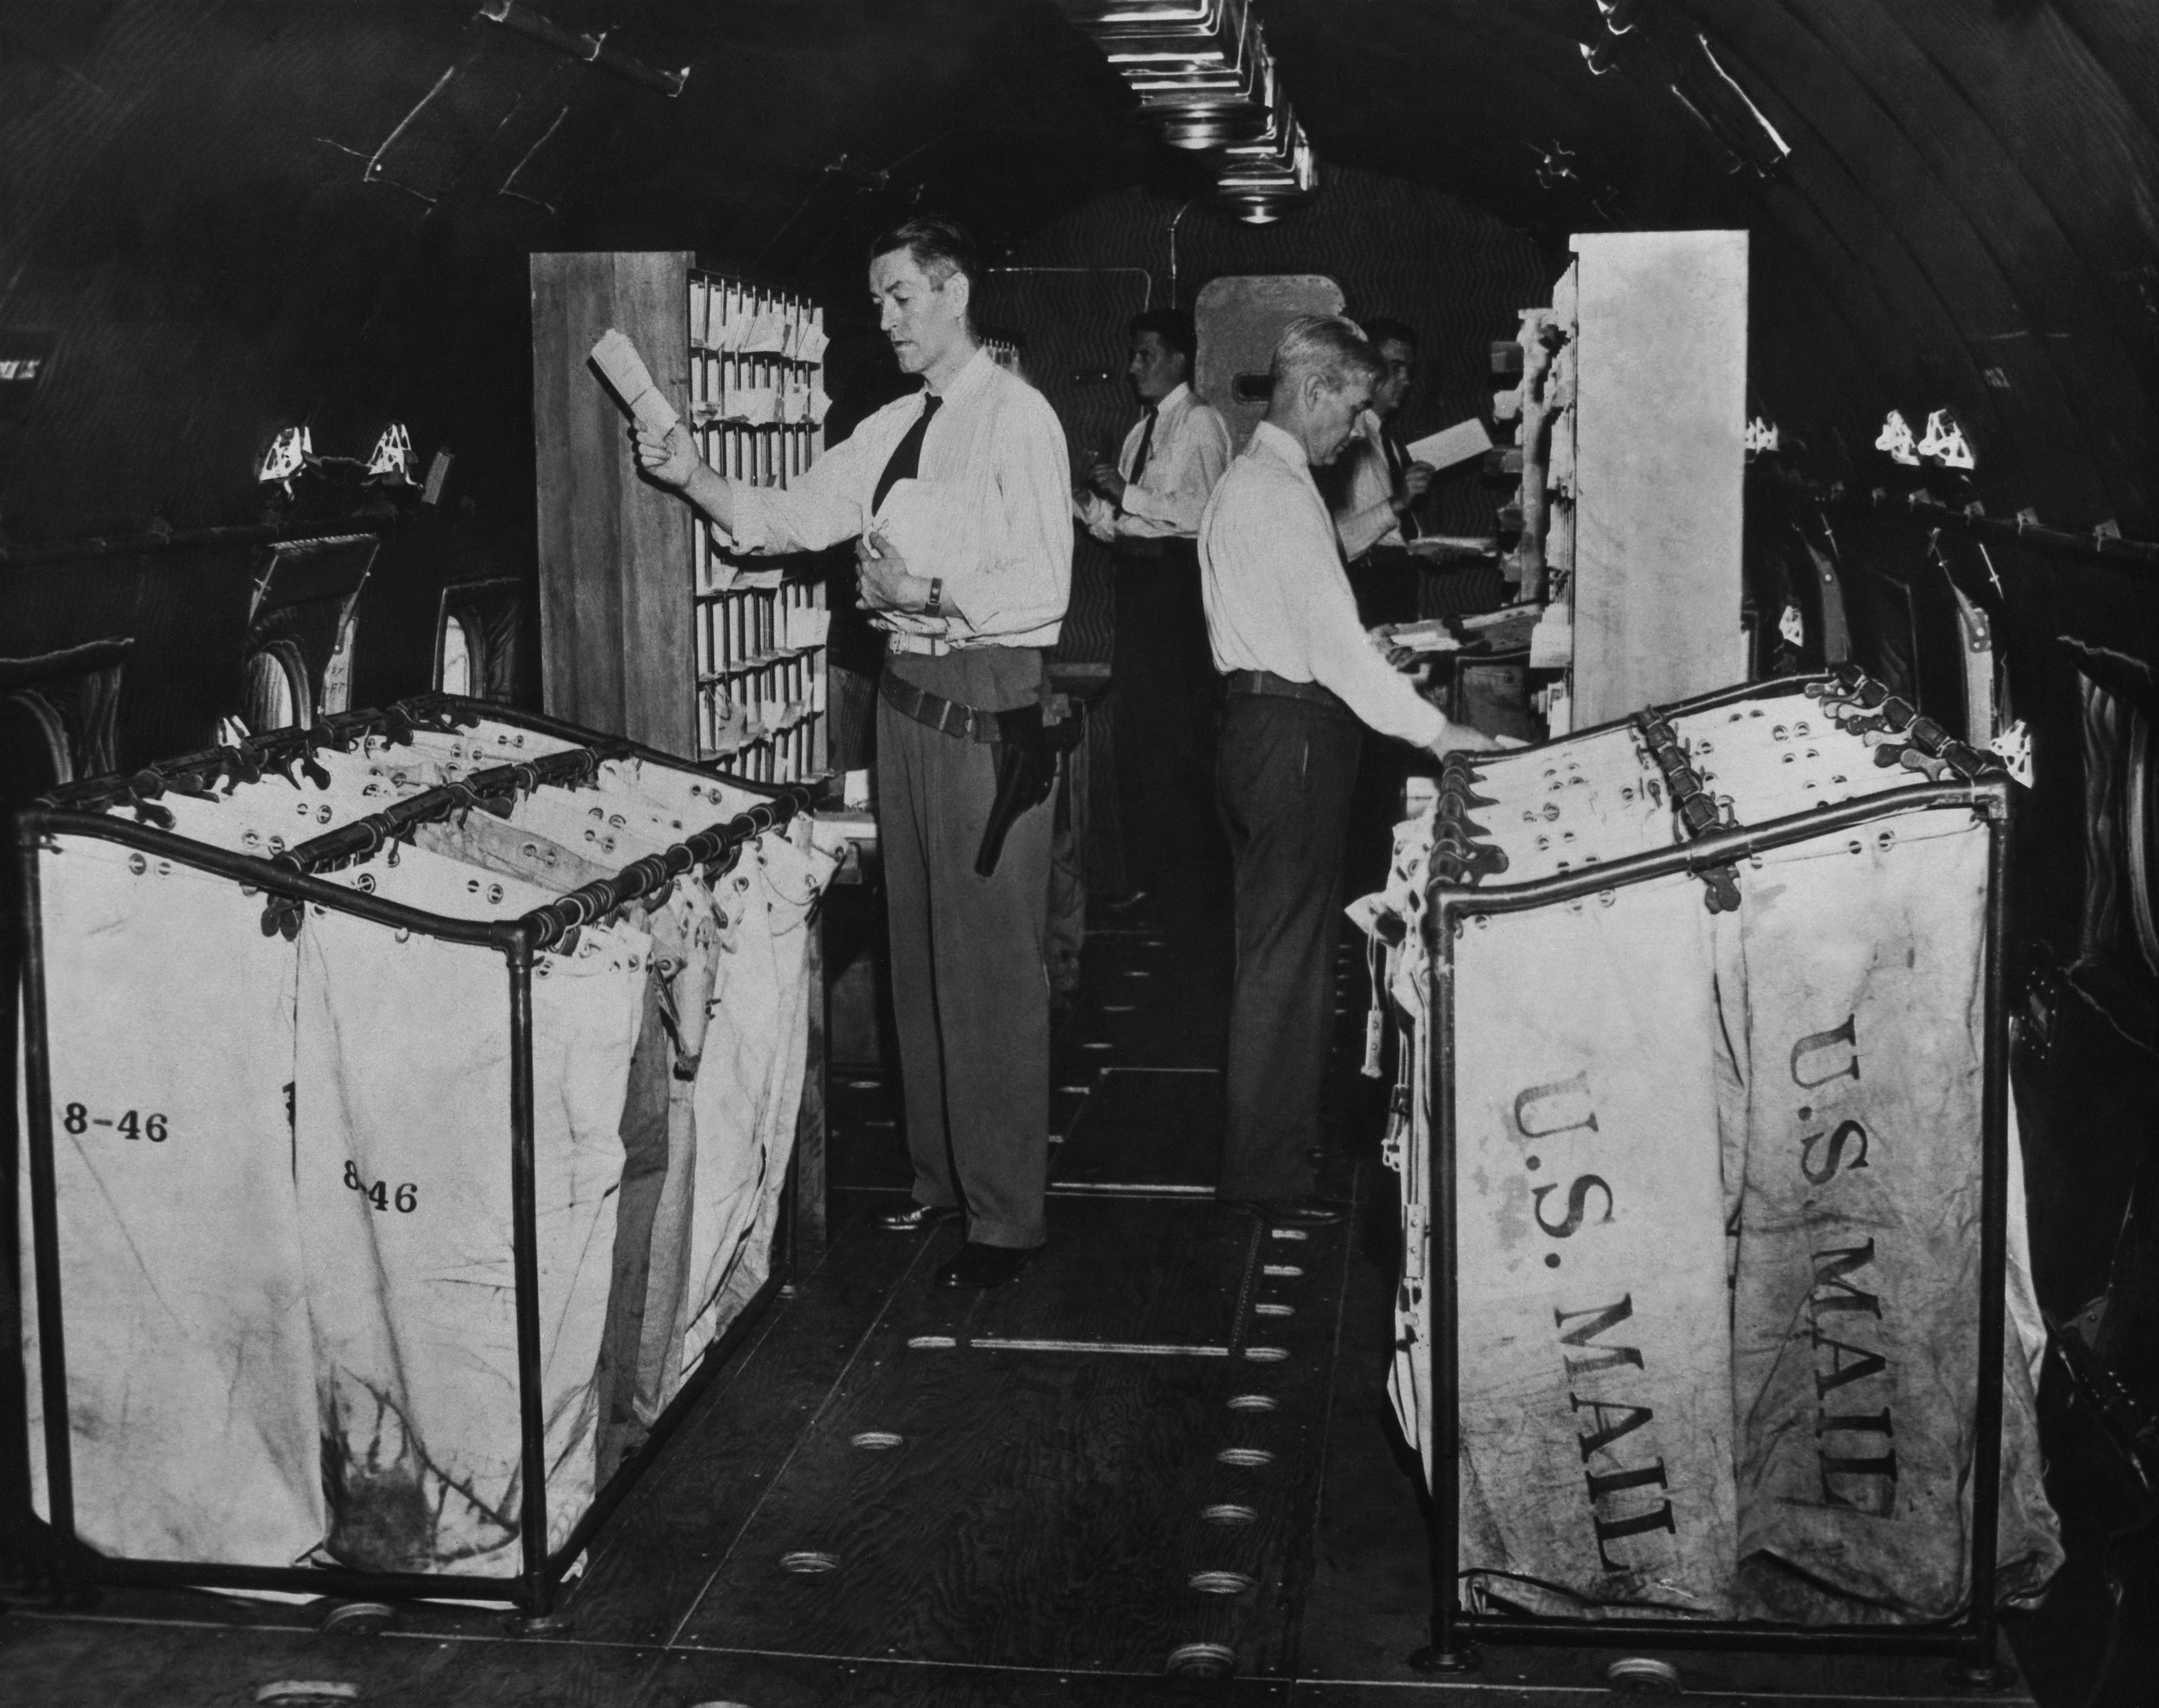 People sort mail into bins circa 1940.